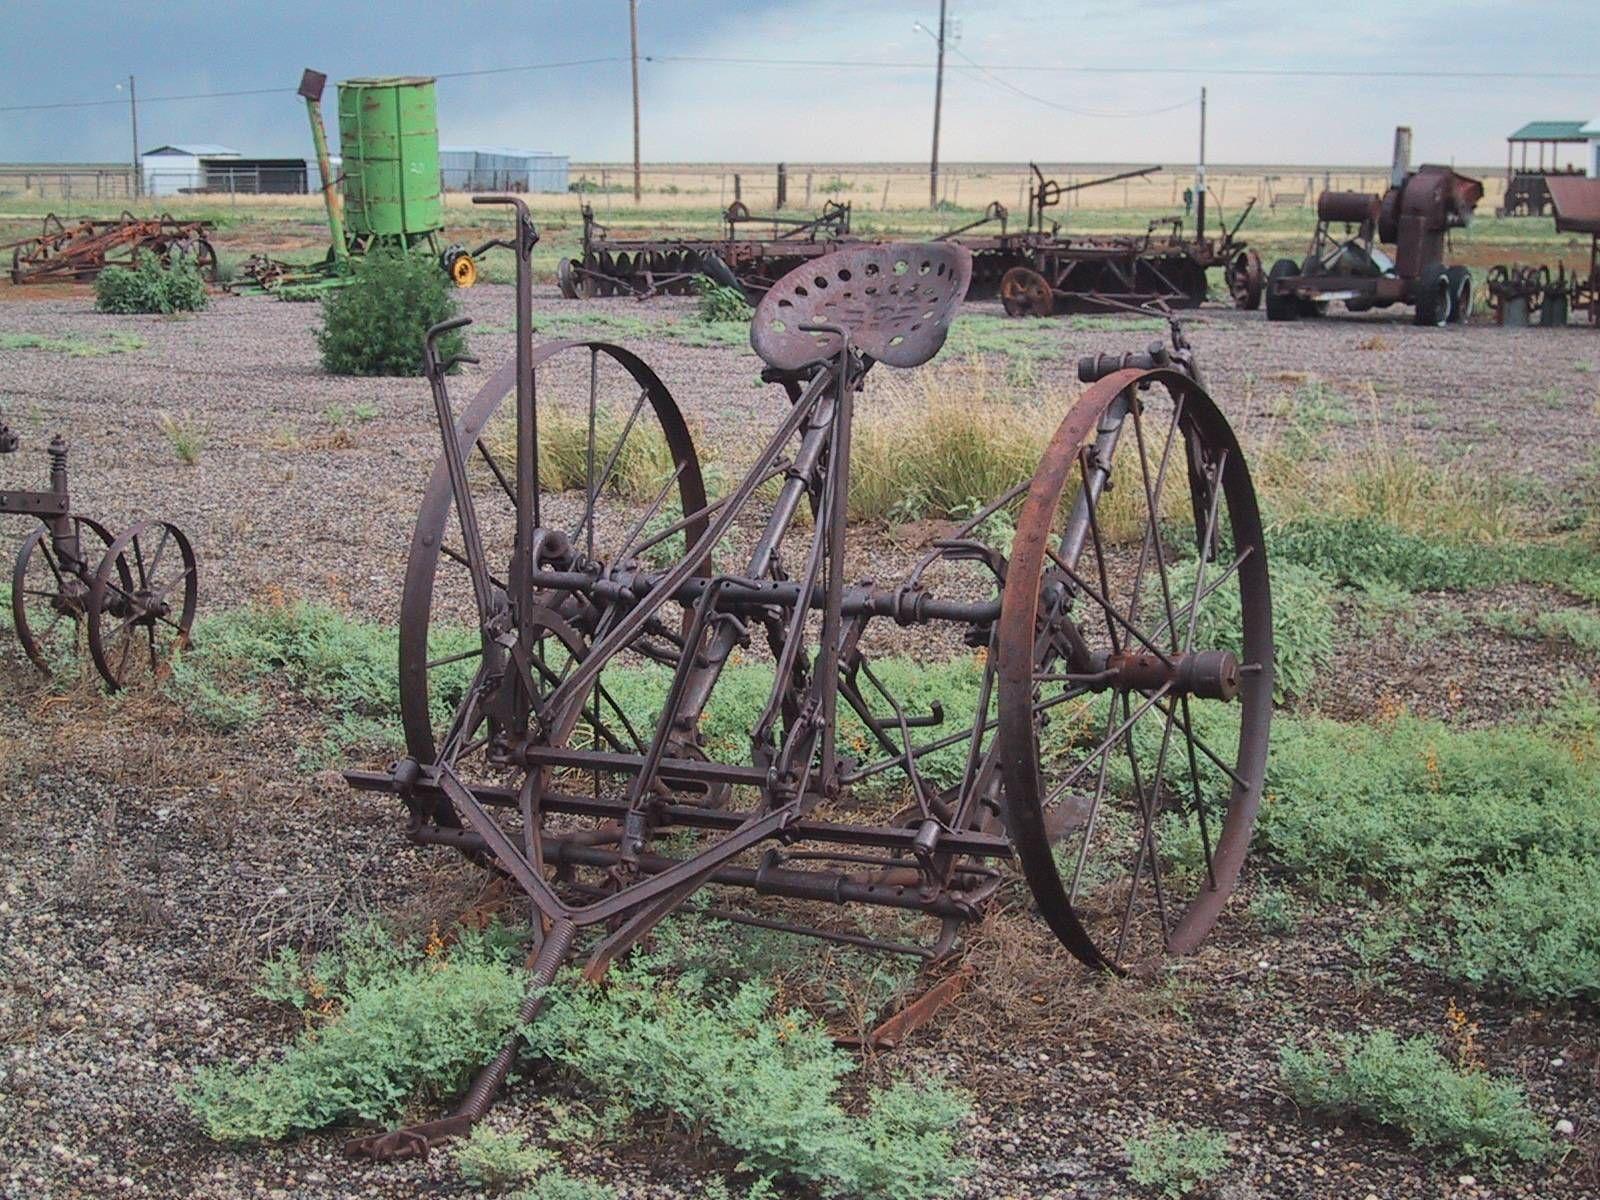 Antique Farm Equipment Diesel Bombers Old Farm Equipment Farm Equipment Old Farm